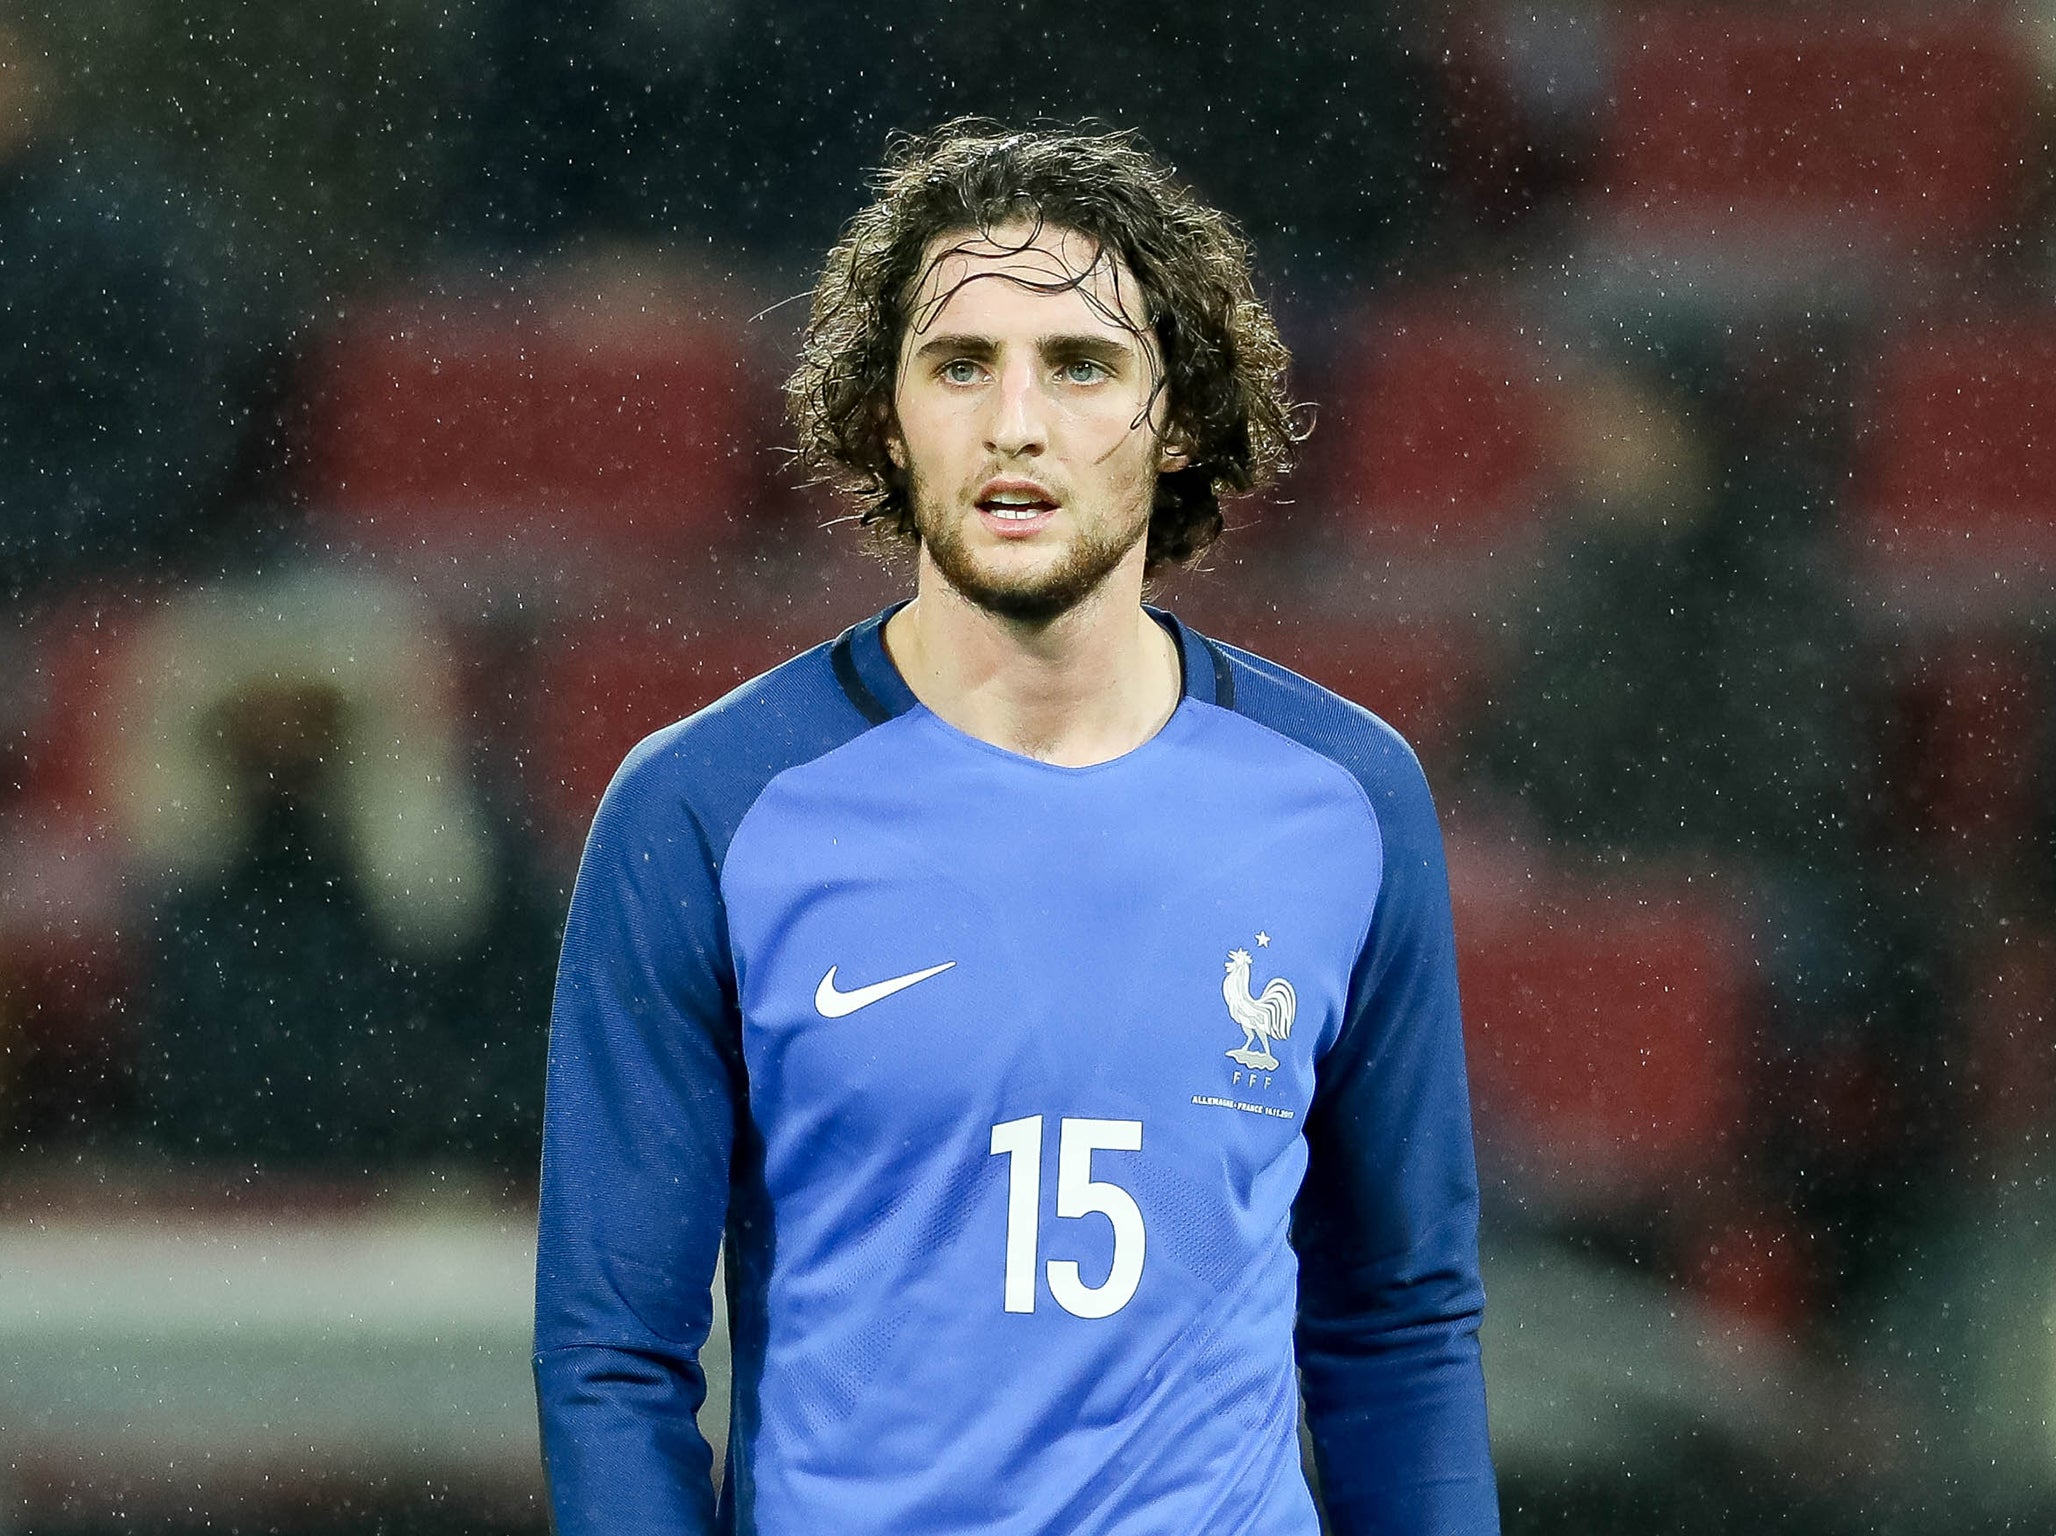 World Cup 2018: Paris Saint-Germain midfielder Adrien Rabiot refuses place on France reserve list